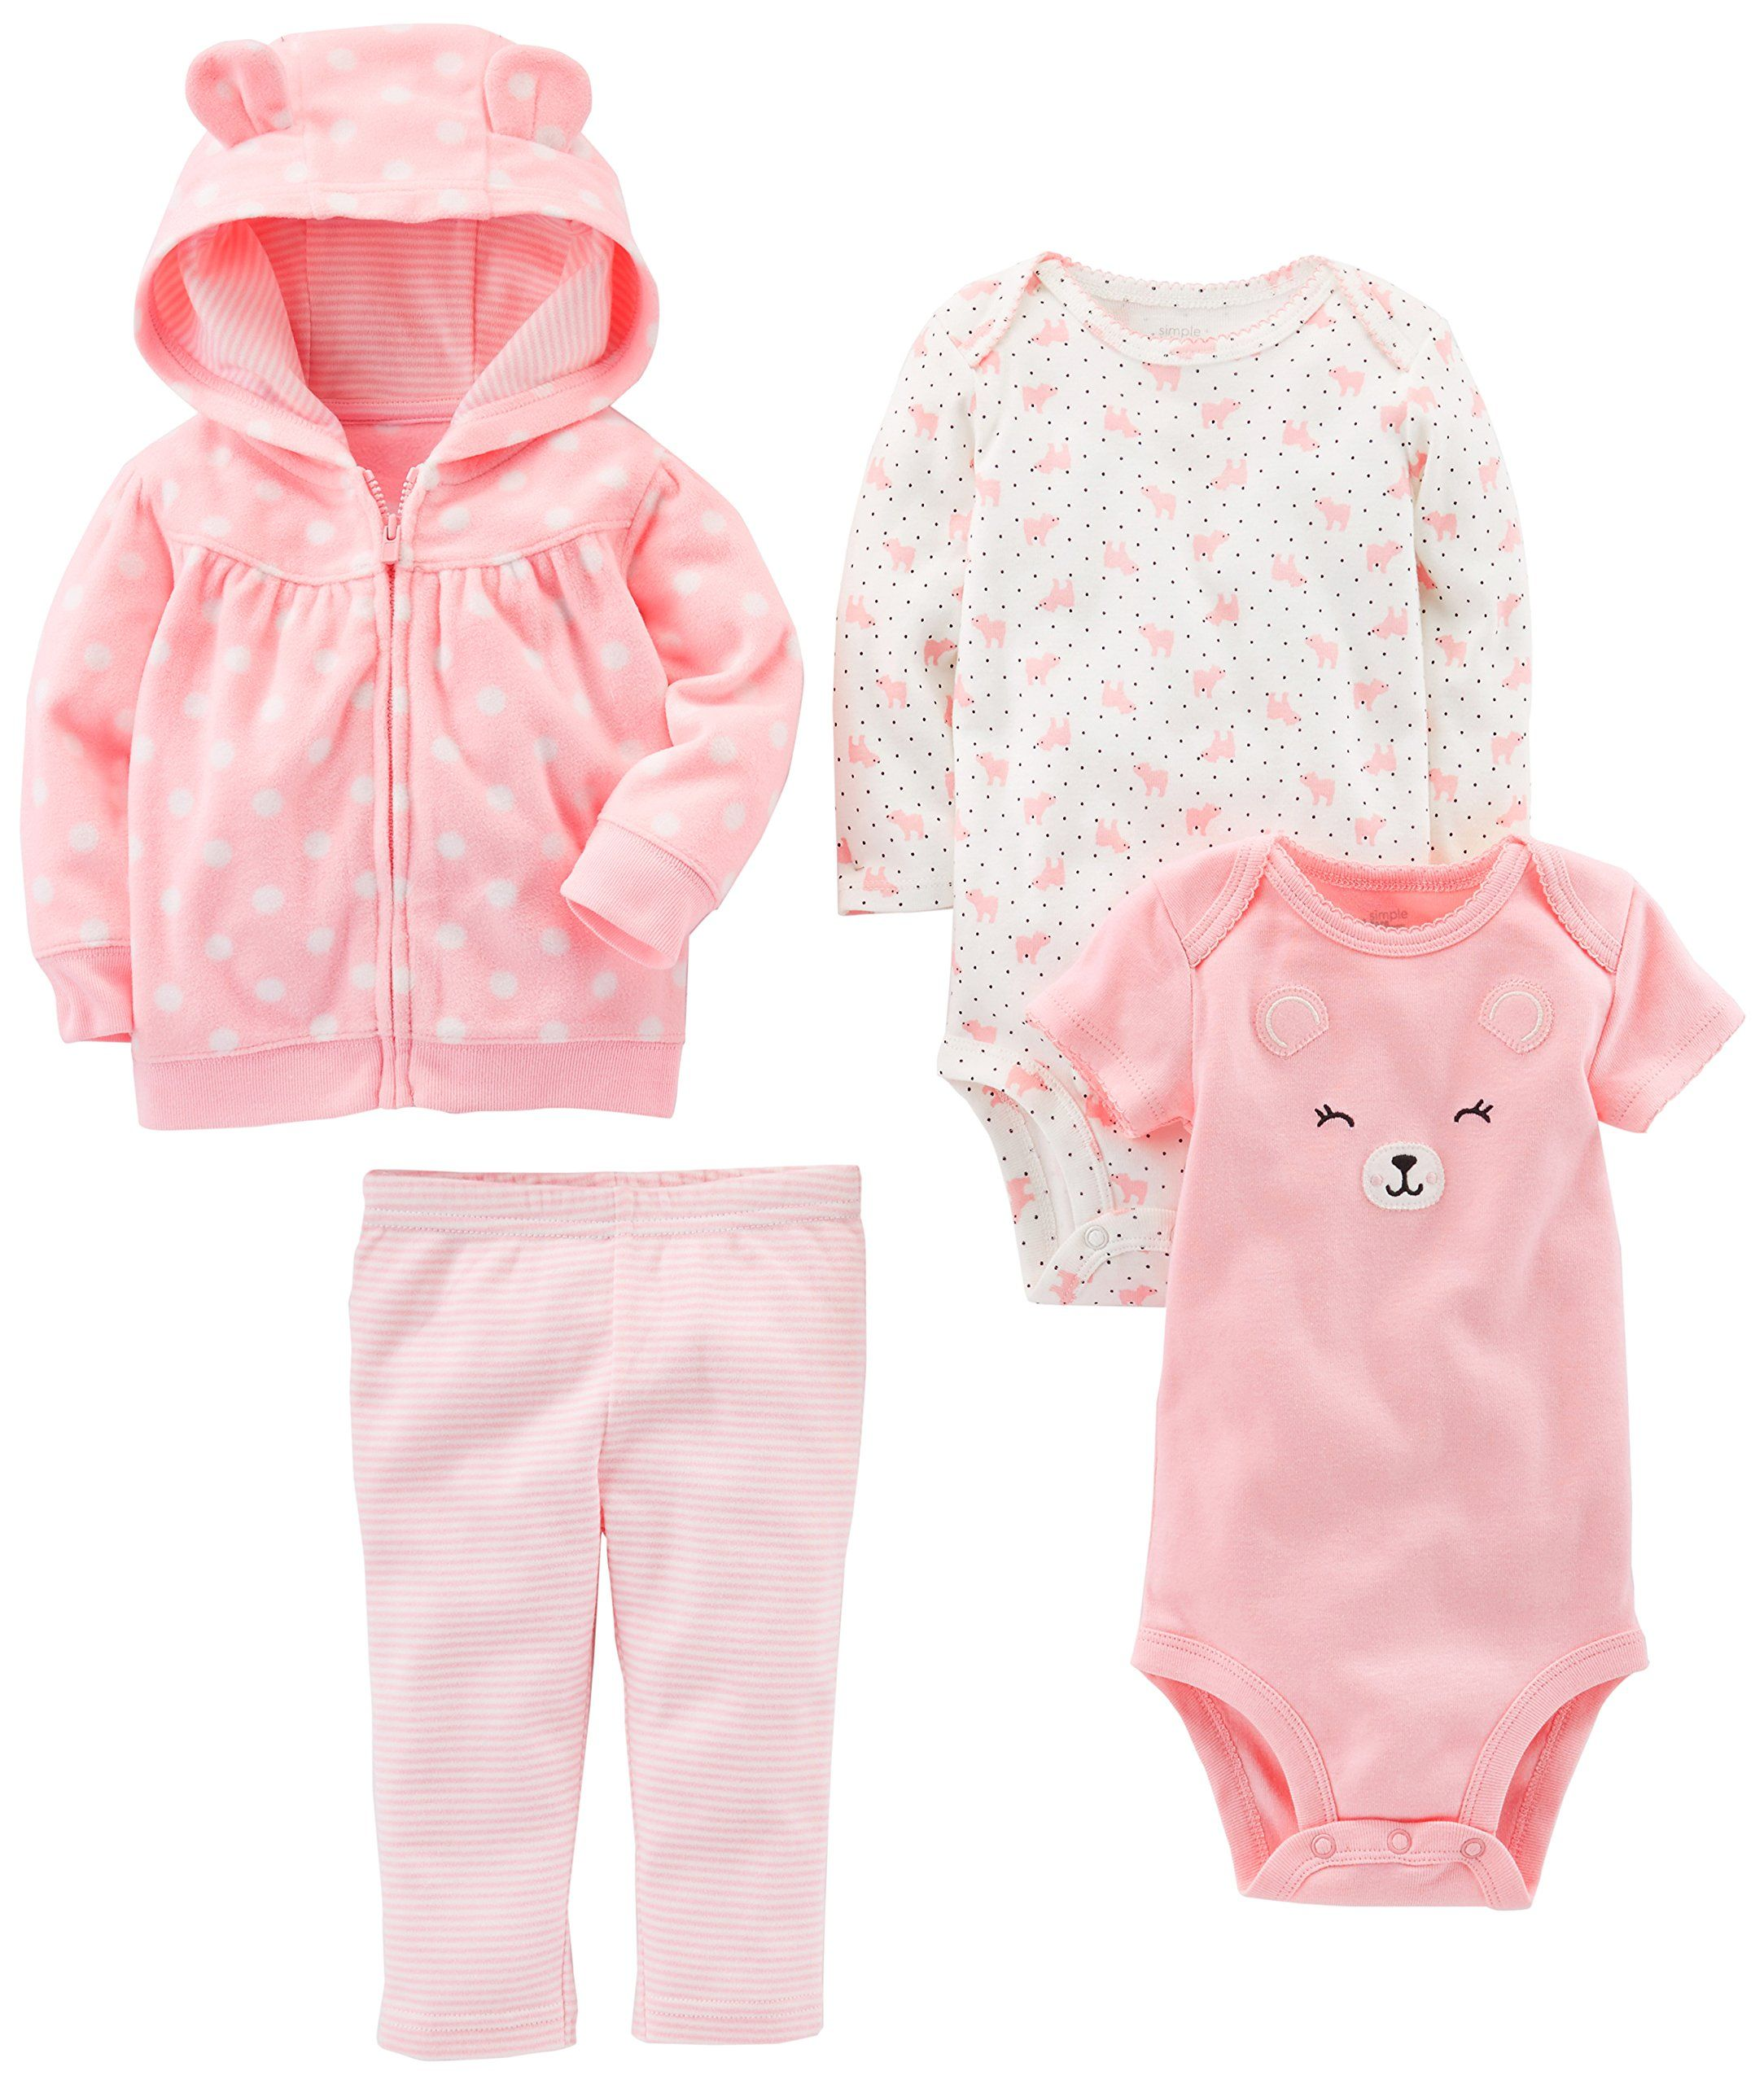 Pant Simple Joys by Carters Baby Girls 4-Piece Fleece Jacket and Bodysuit Set